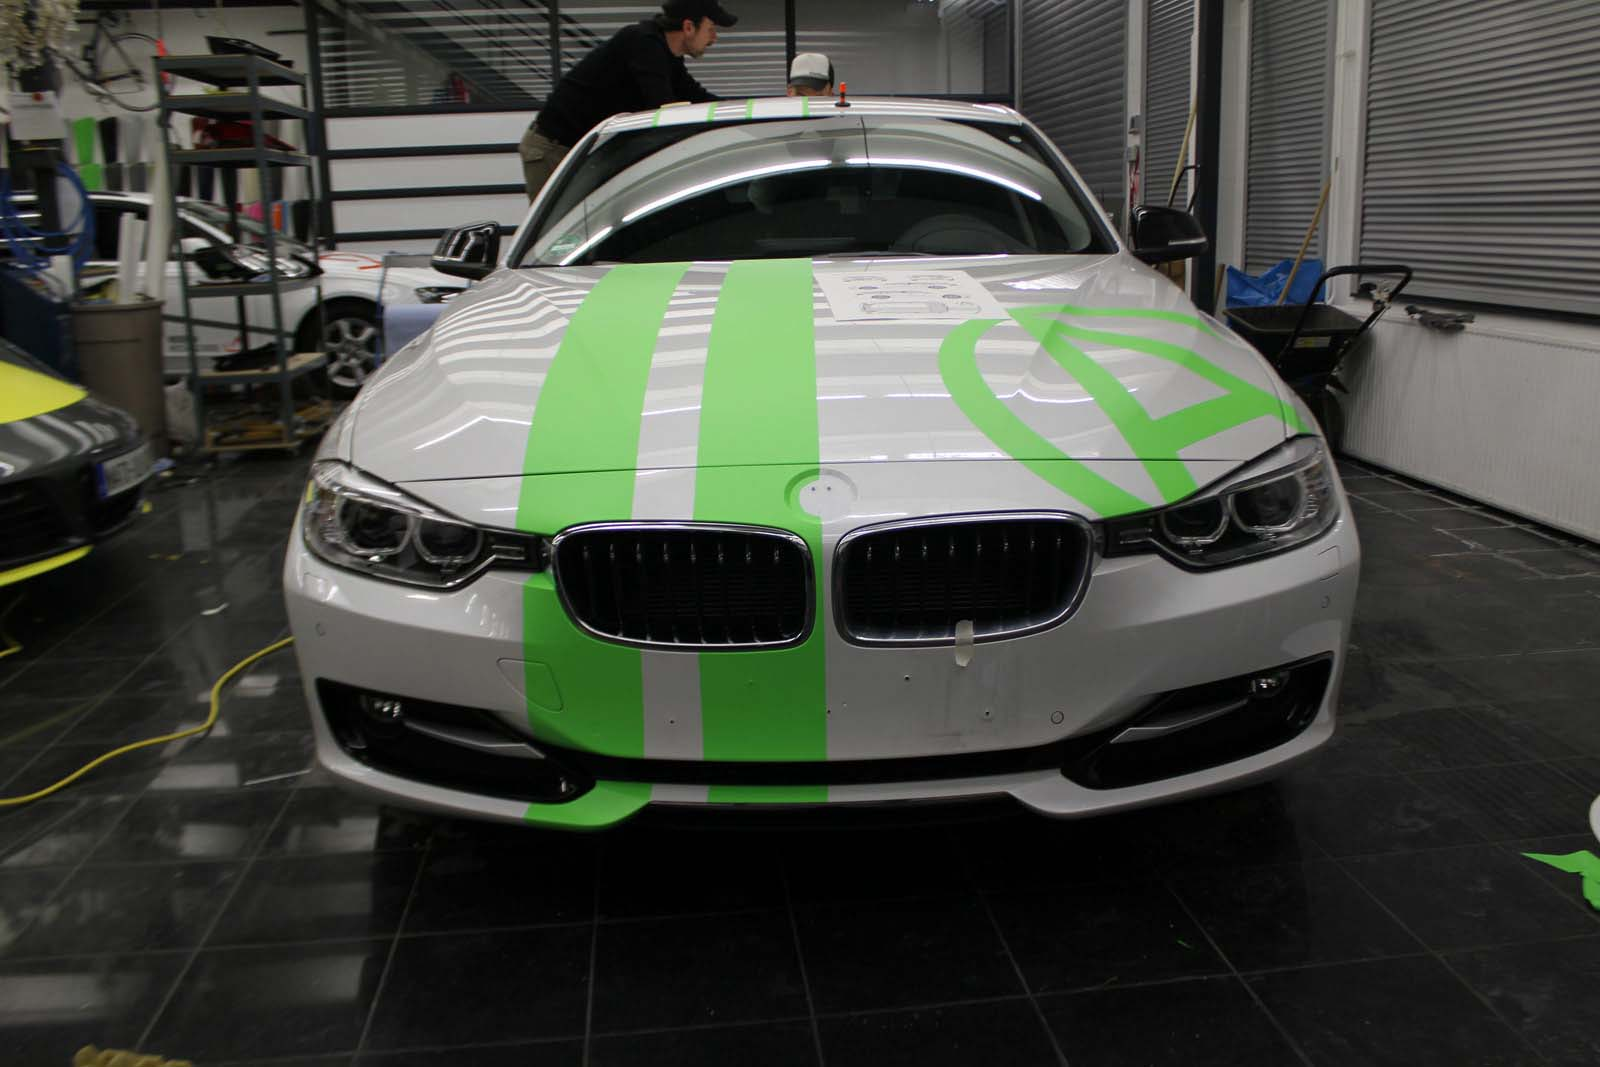 BMW_3ER_RALLYESTREIFEN_WEISS_GRUEN_MATT_MIT_BRANDING_03